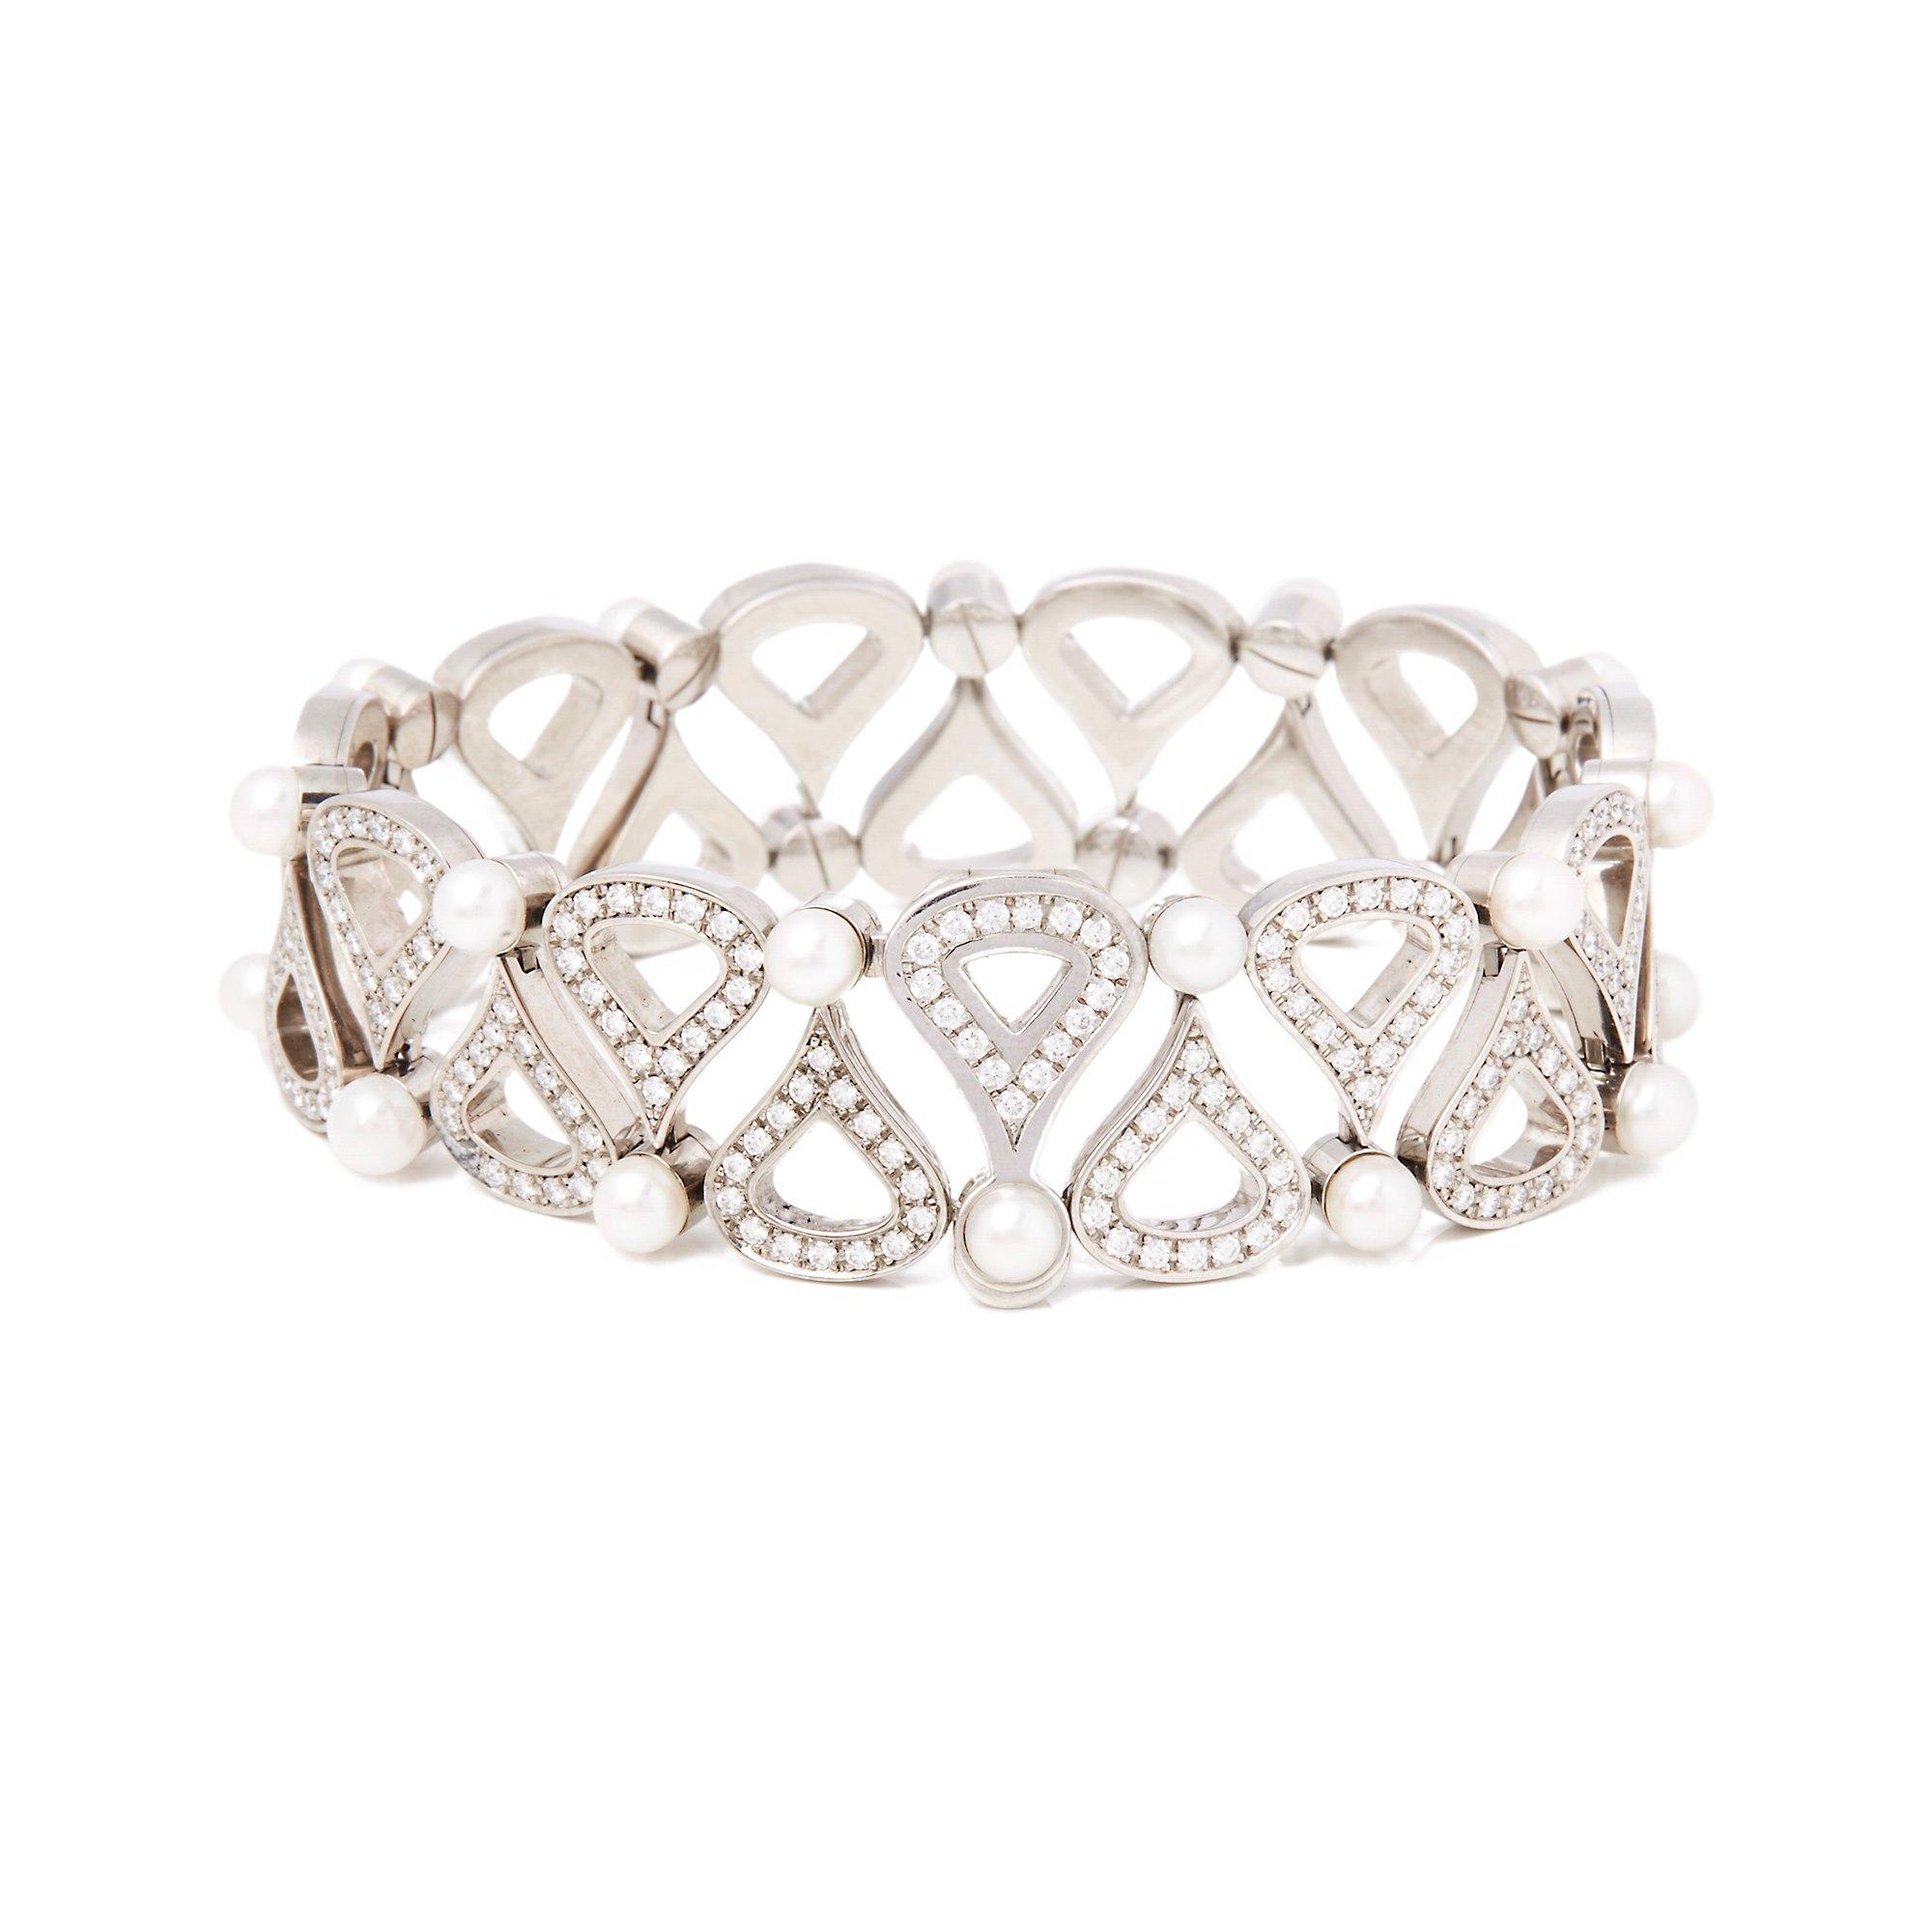 Chopard 18k White Gold Cultured Pearl & Diamond Bracelet